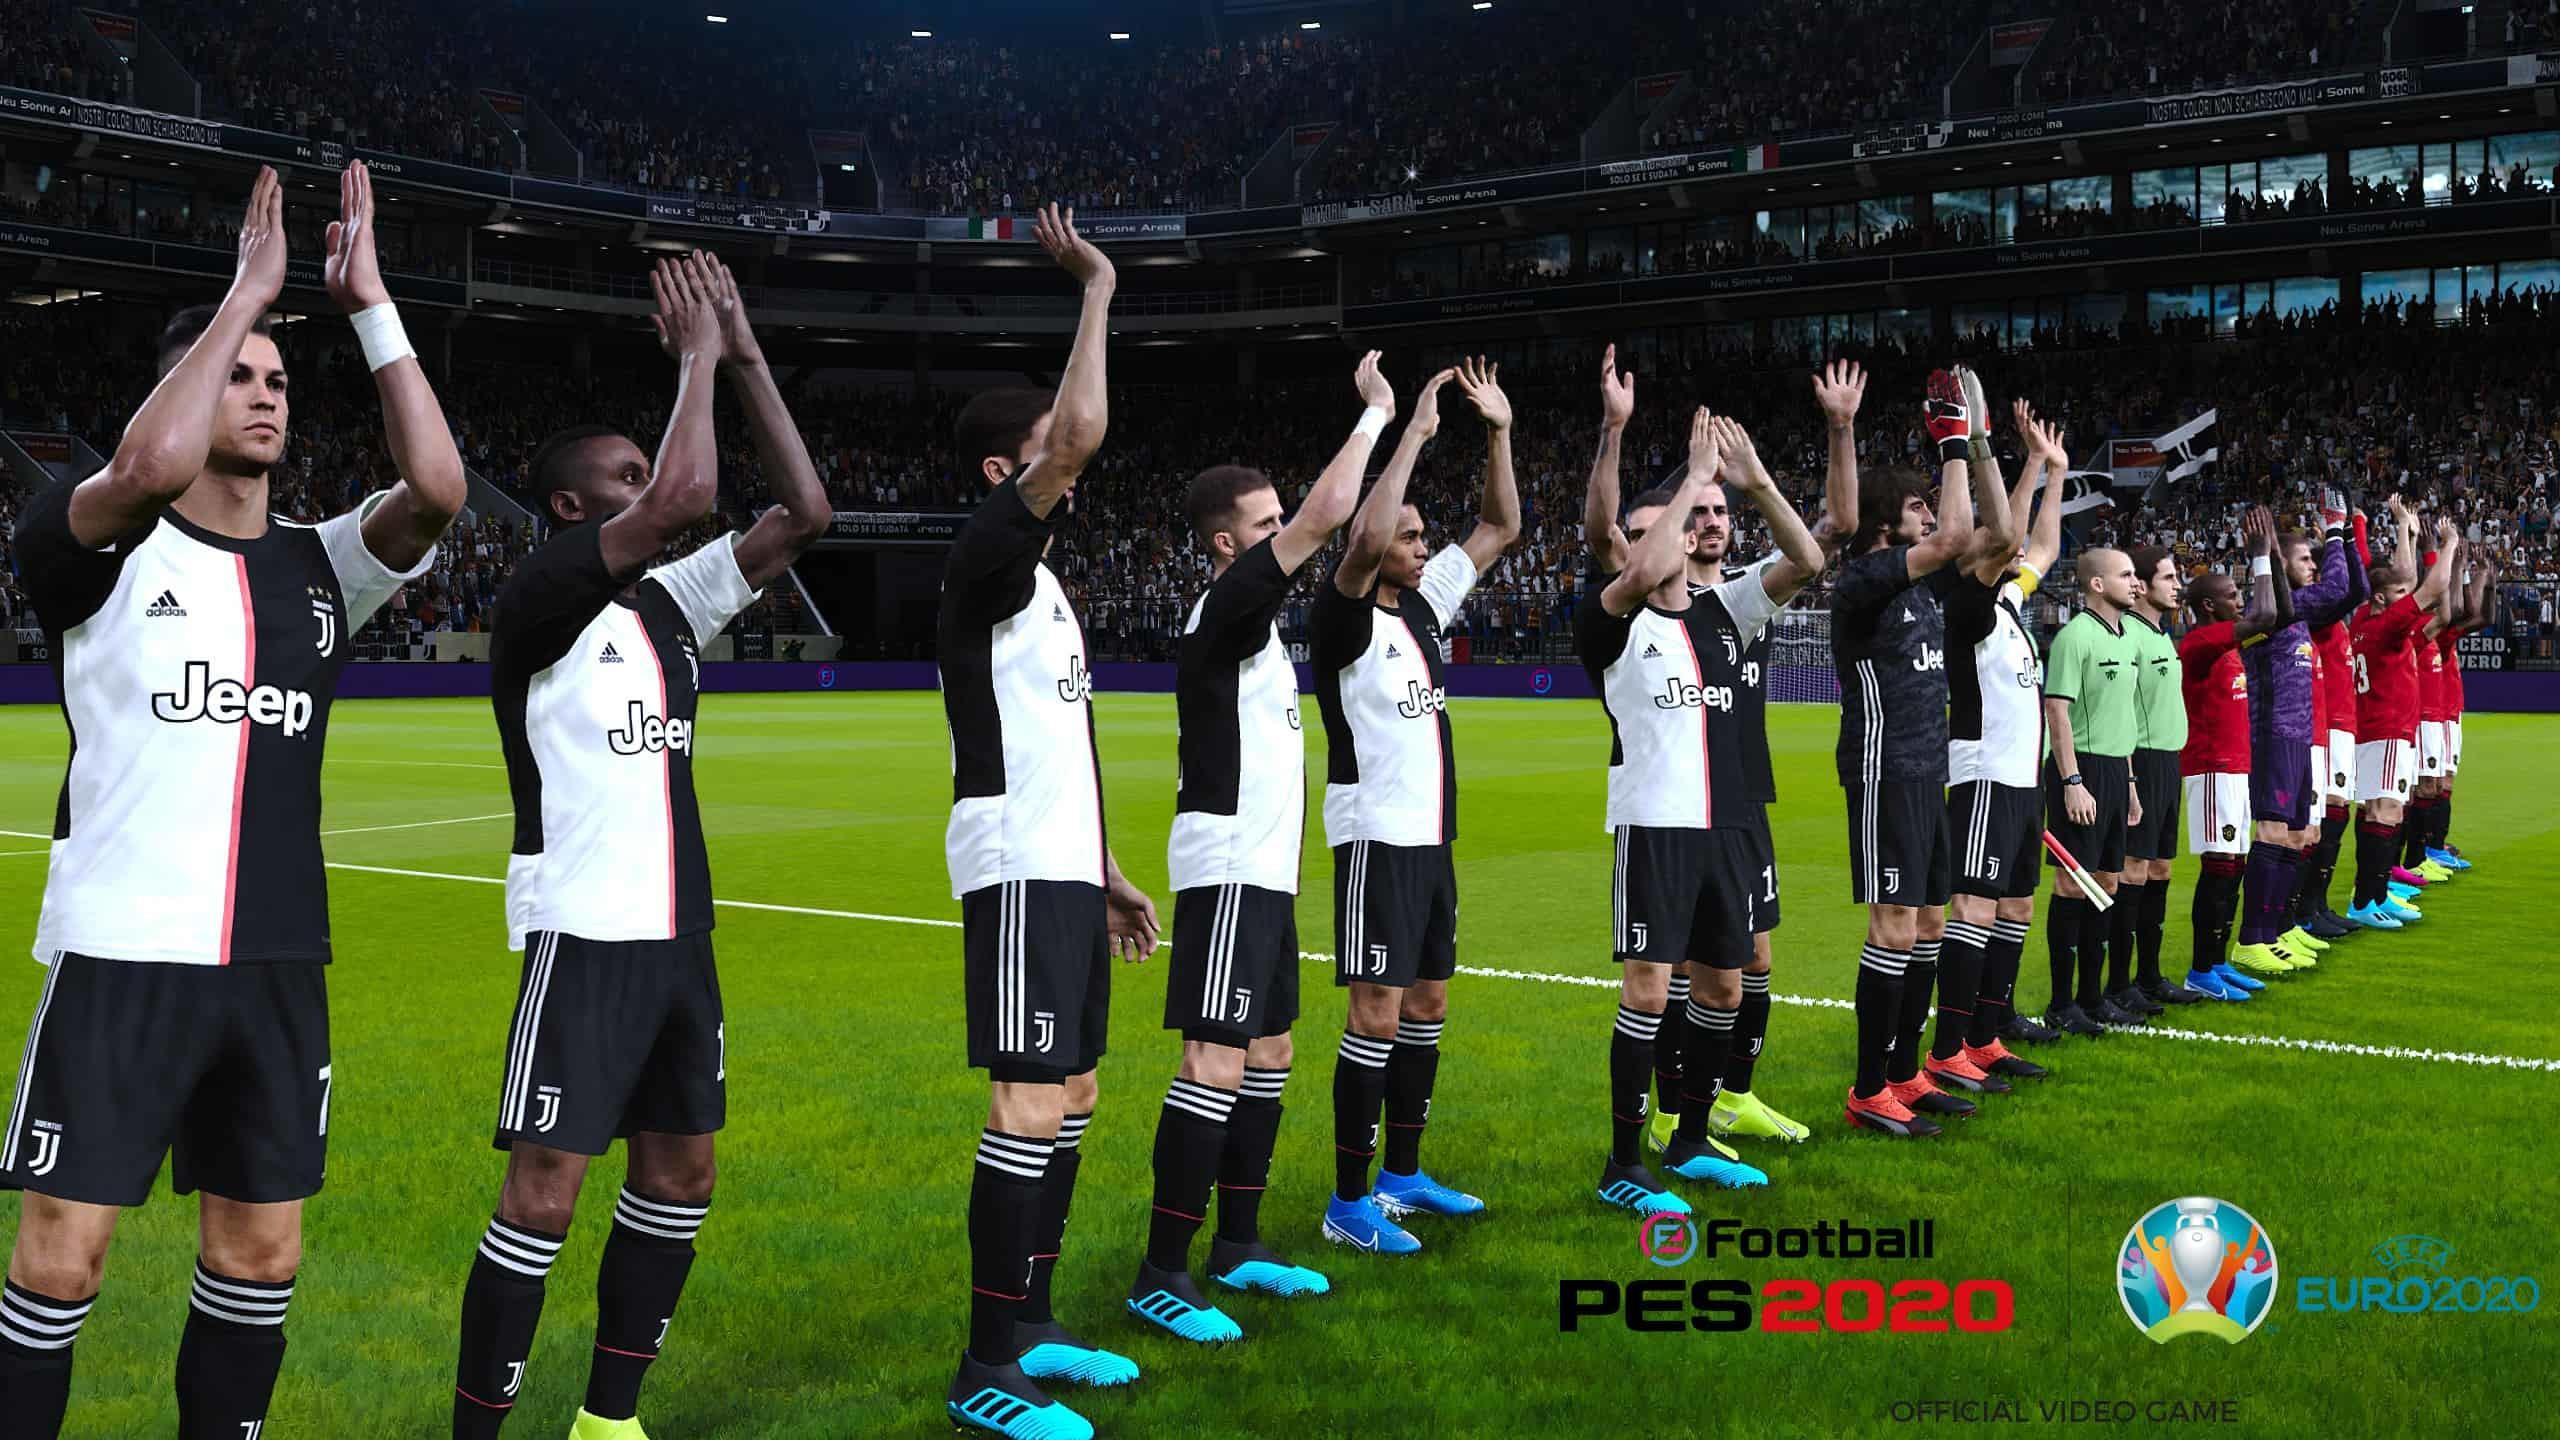 ايفوتبول بيس 2020 صفقة يورو دوري ايطالي رياضات الكترونية efootball pes 2020 uefa euro 2020 dlc serie a license deal